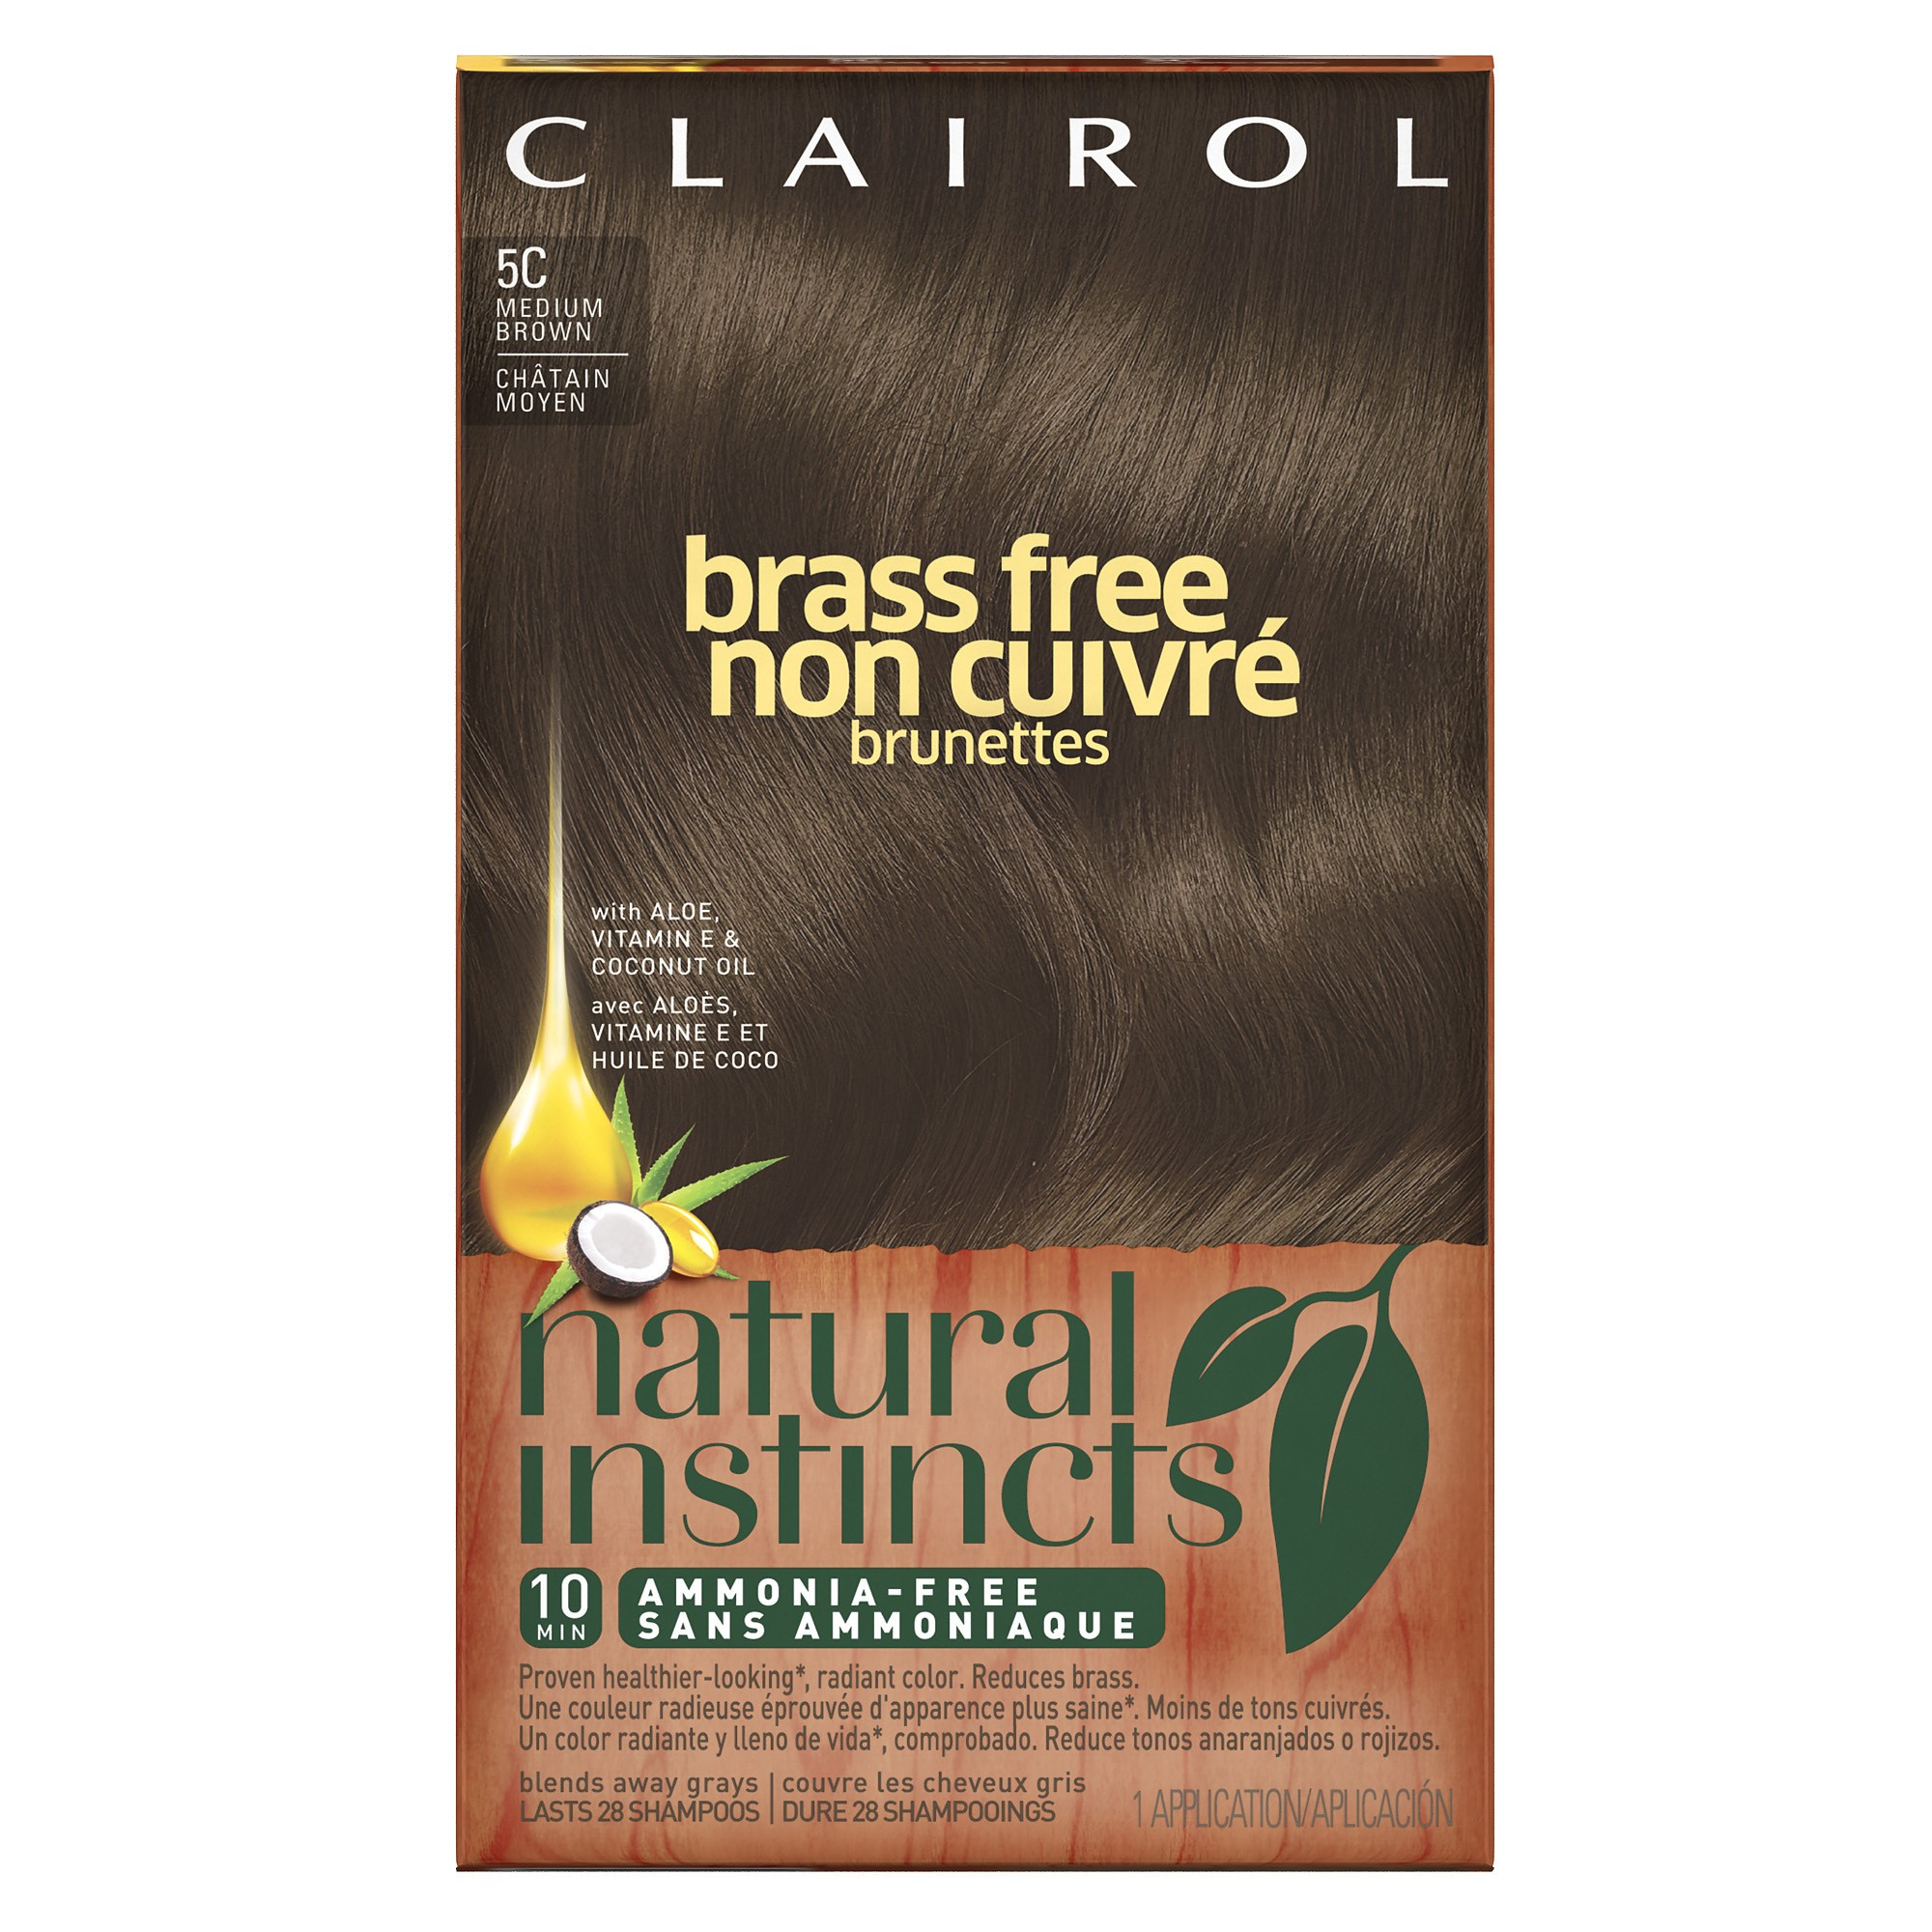 Clairol natural instincts hair color 22 medium auburn brown 1 clairol natural instincts hair color 22 medium auburn brown 1 kit walmart nvjuhfo Image collections